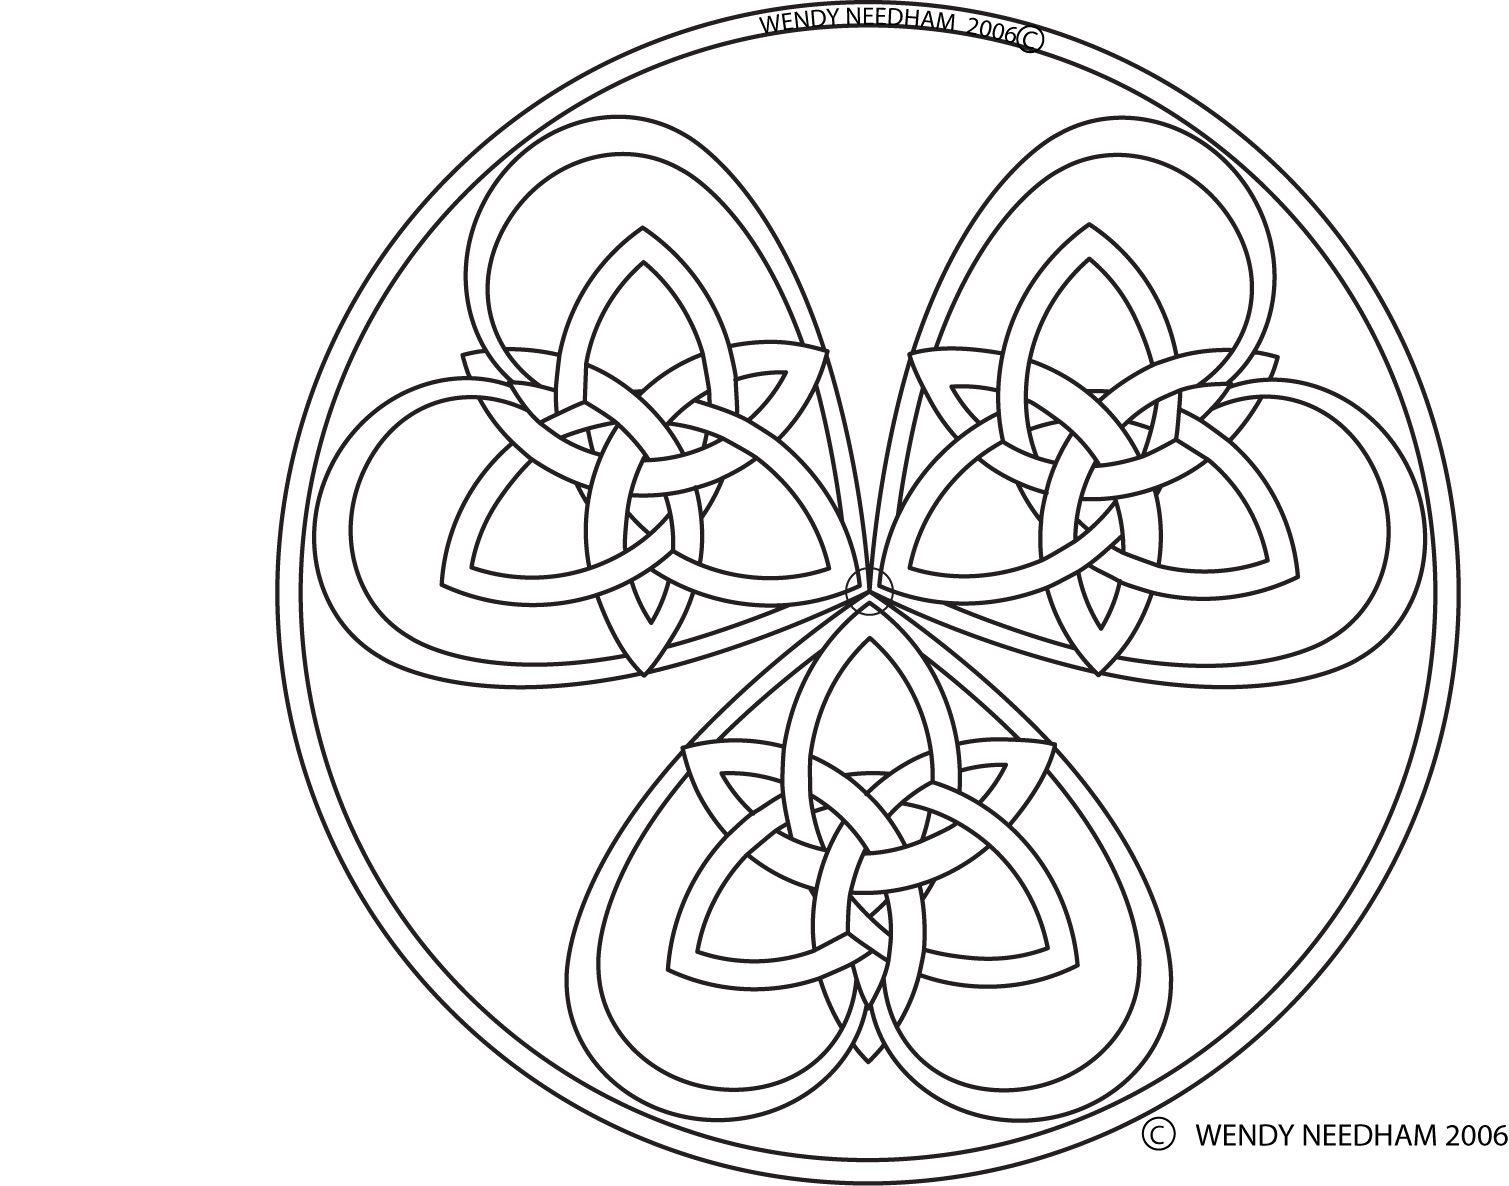 Pin de Jean Wetherilt en Create | Pinterest | Celta, Mandalas y ...